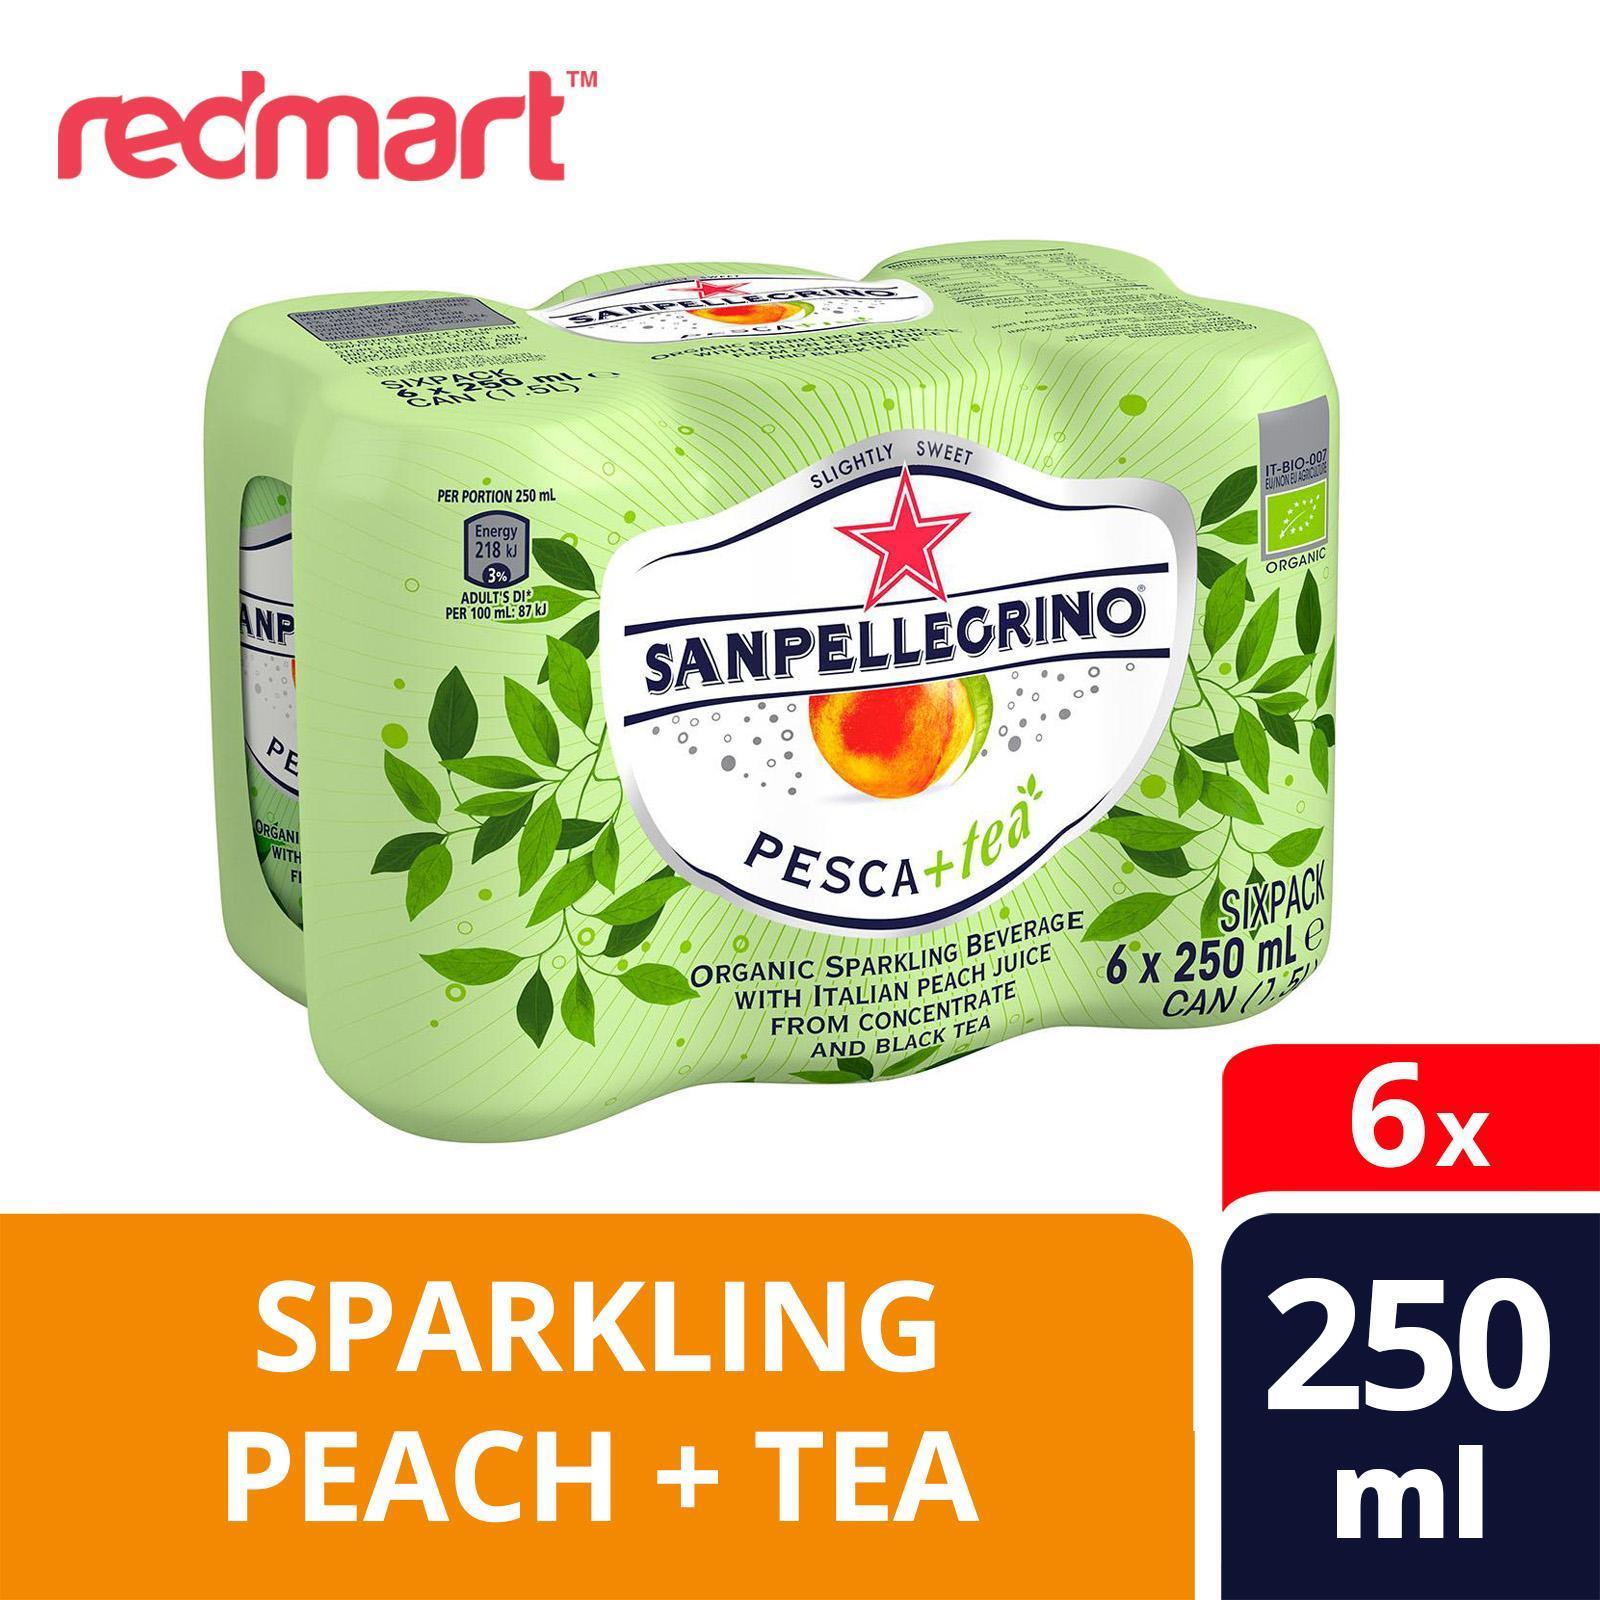 San Pellegrino Pesca+Tea Organic Sparkling Peach Tea Beverage - 6s Pack